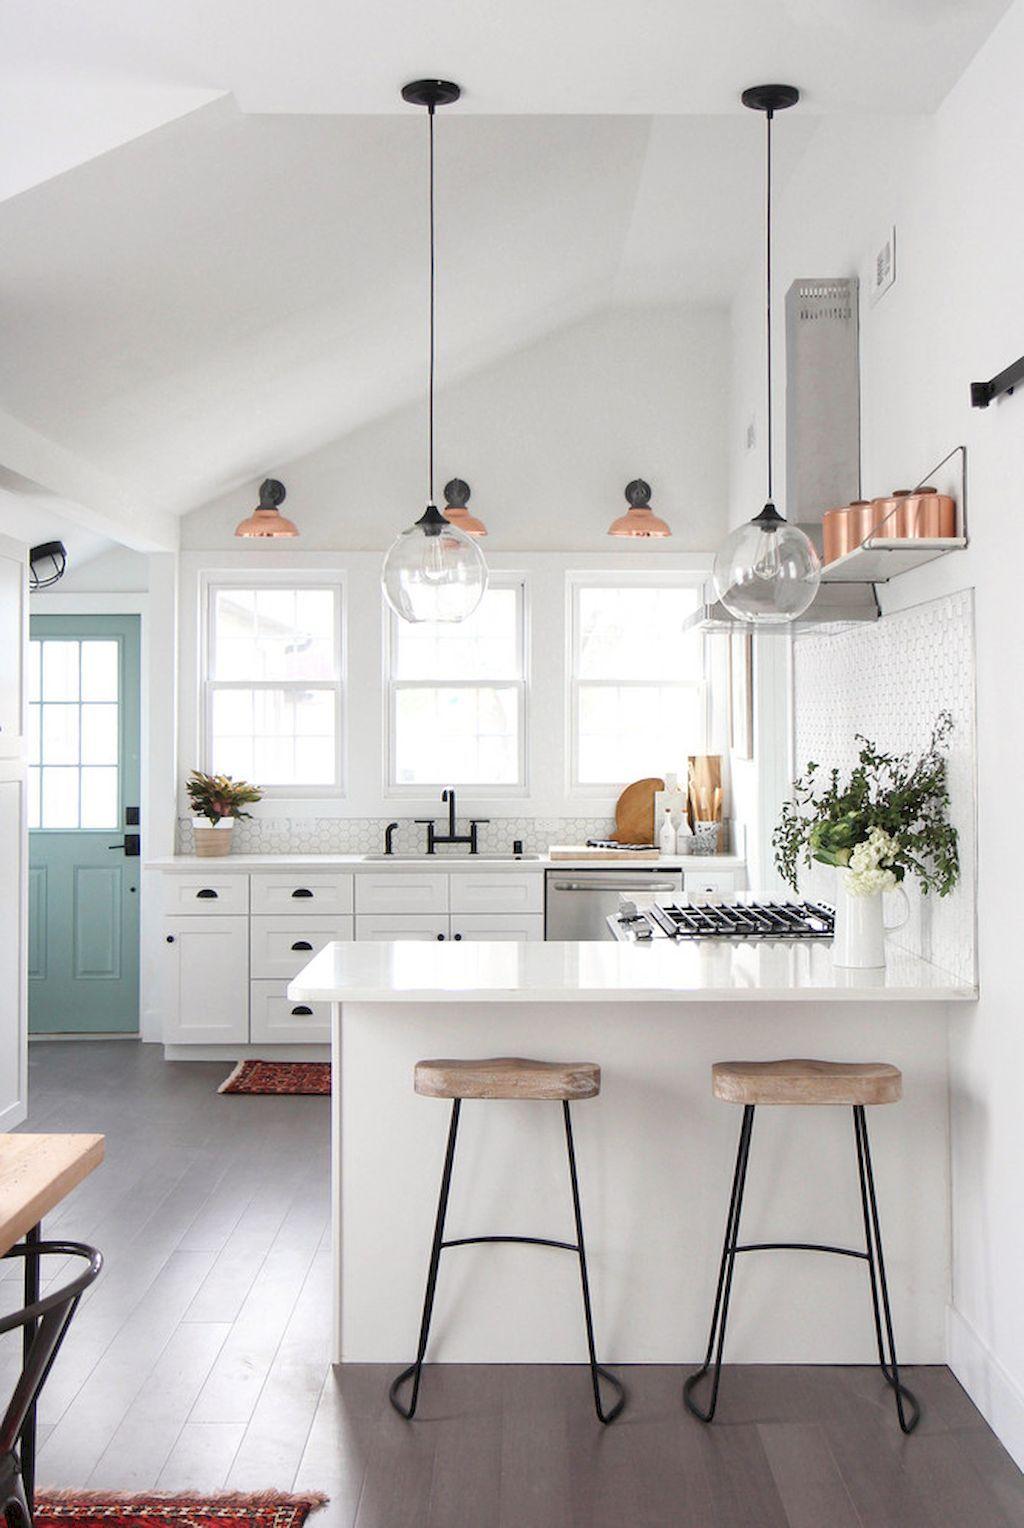 50 Stunning Small Kitchen Design Ideas | Organisation ideas, Storage ...